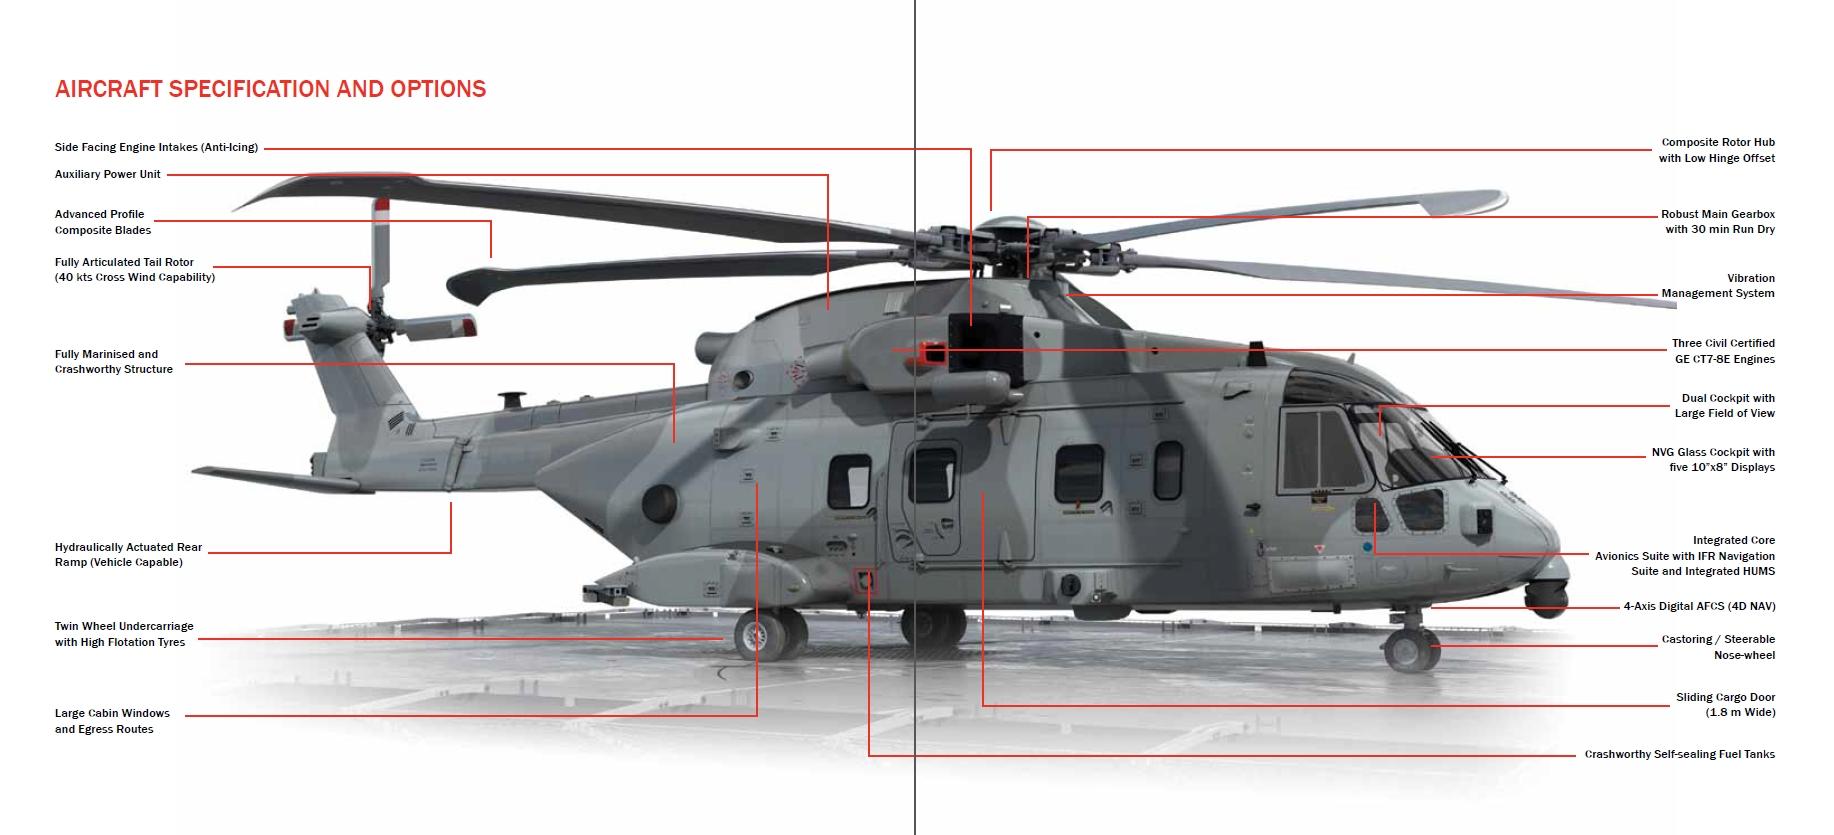 AW101-5 - Copy.jpg